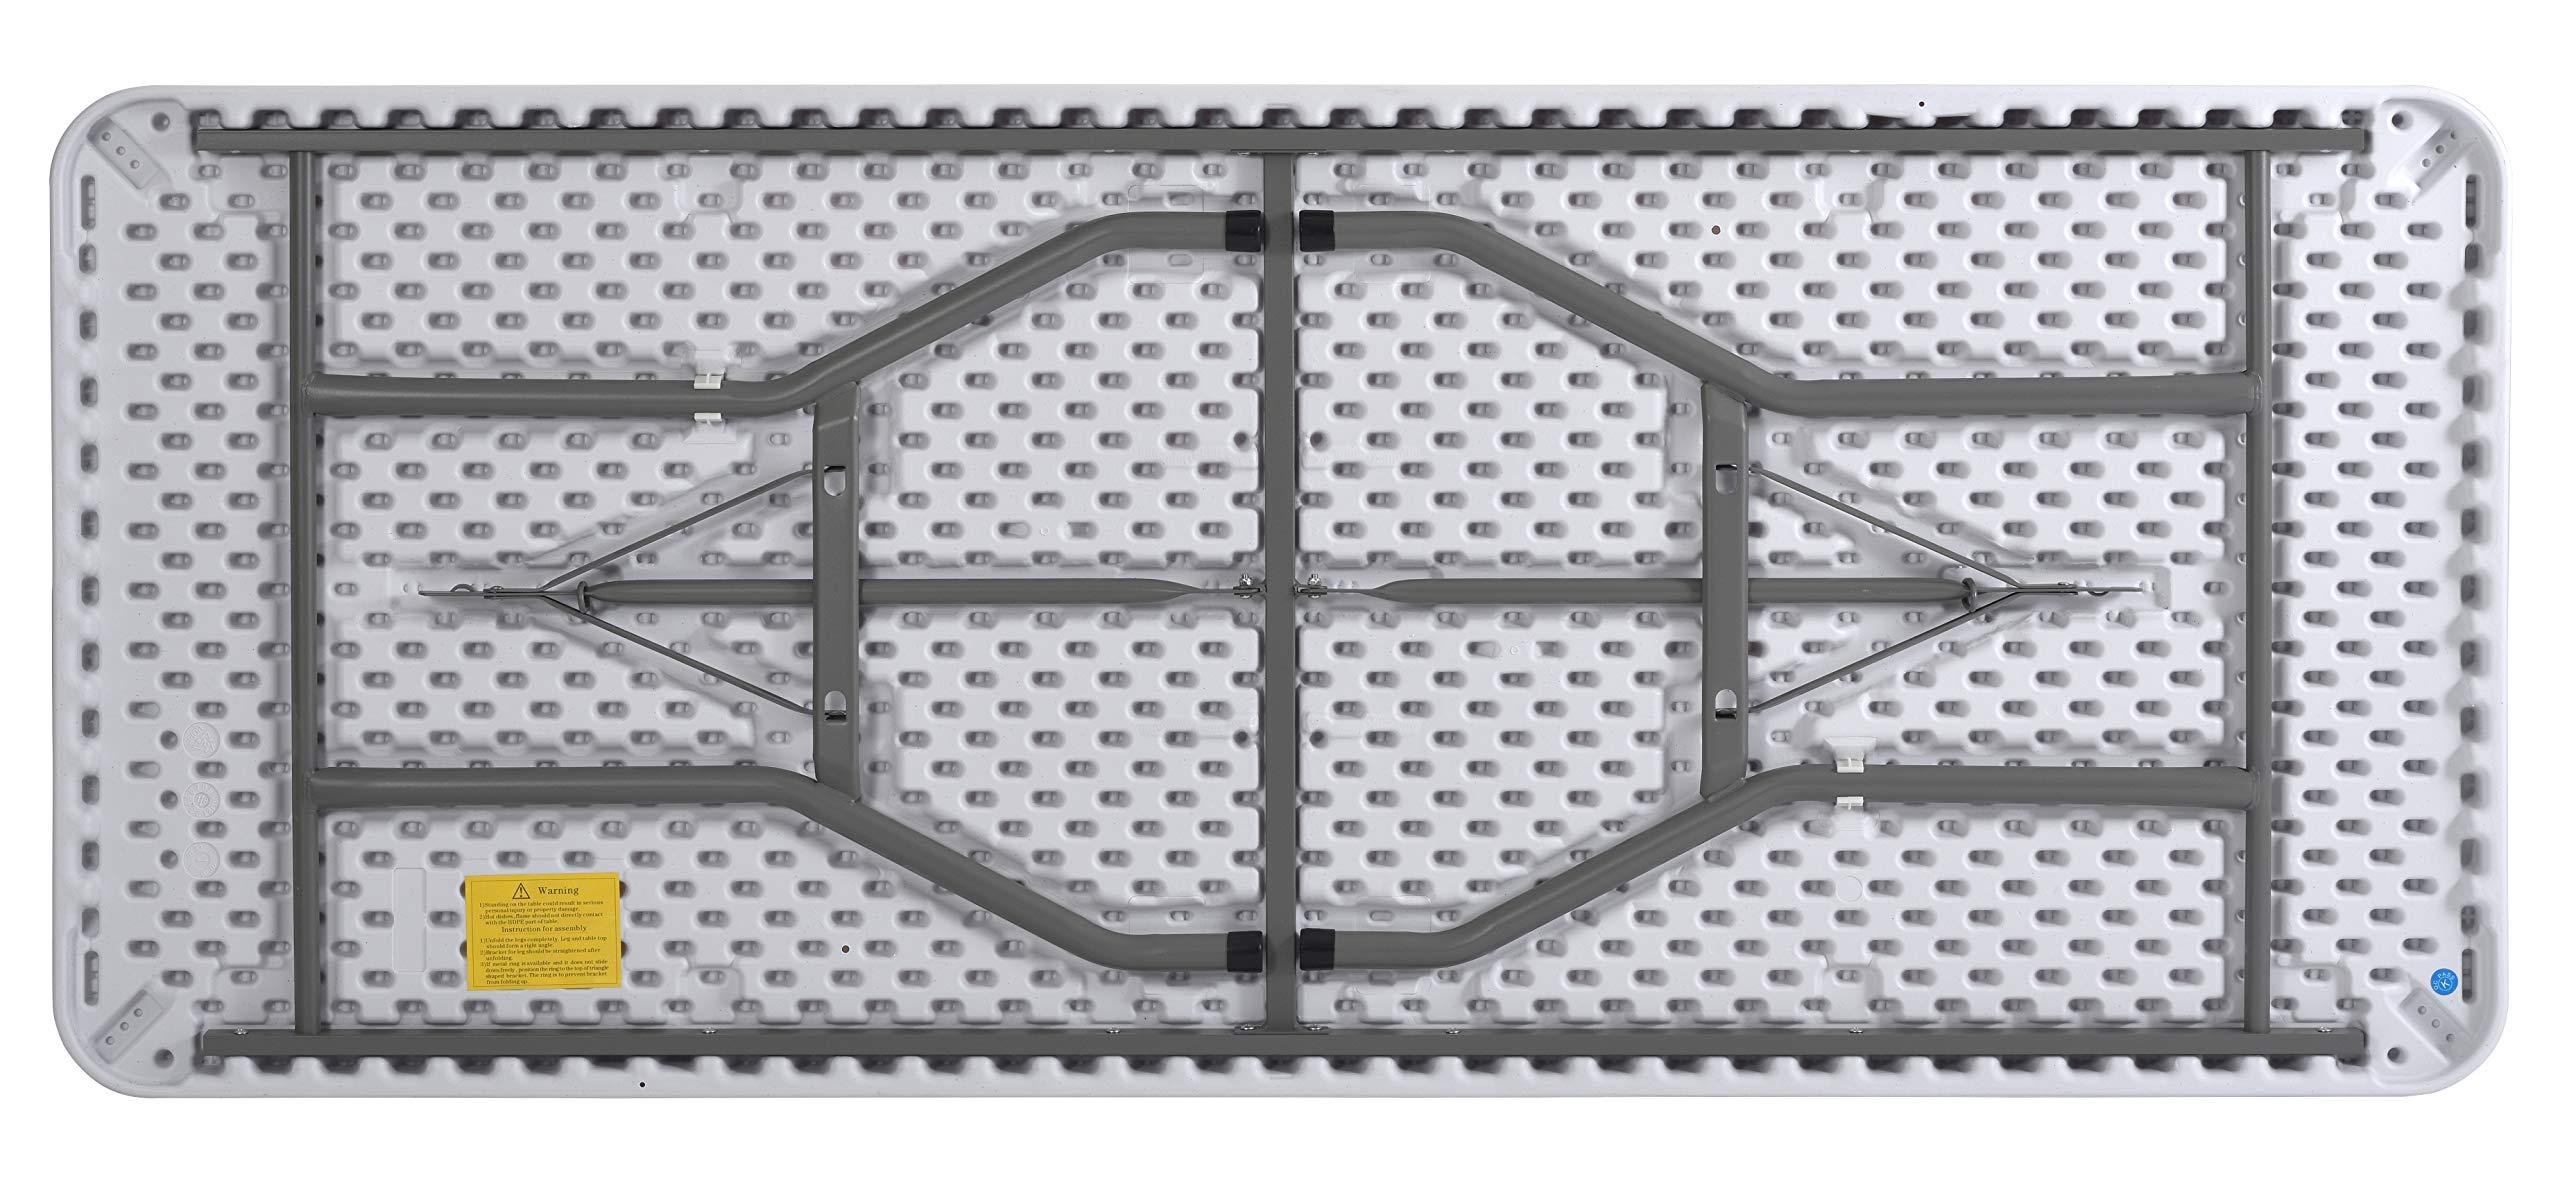 Sandusky Lee FPT7230-WV2 Commercial Fold in Half Utility Table, 6', White, 29'' Height, 72'' Width, 30'' Length by Sandusky